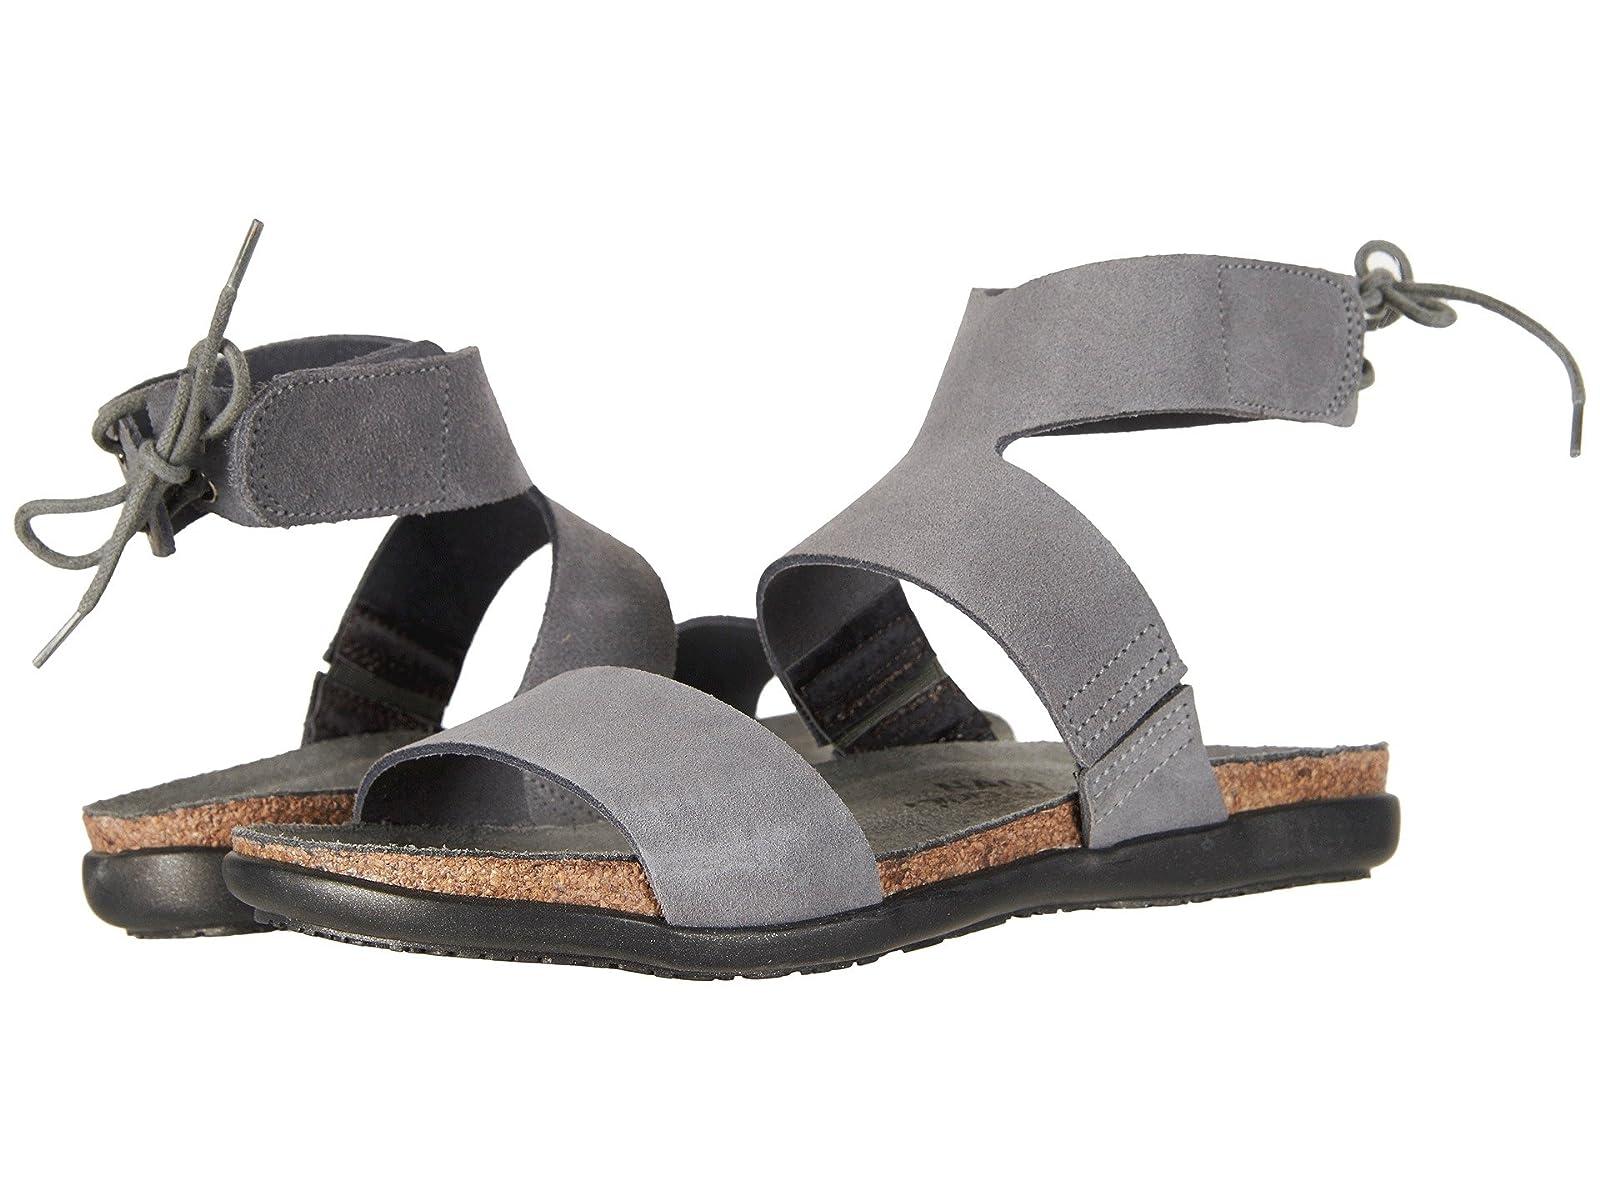 Naot LarissaAtmospheric grades have affordable shoes